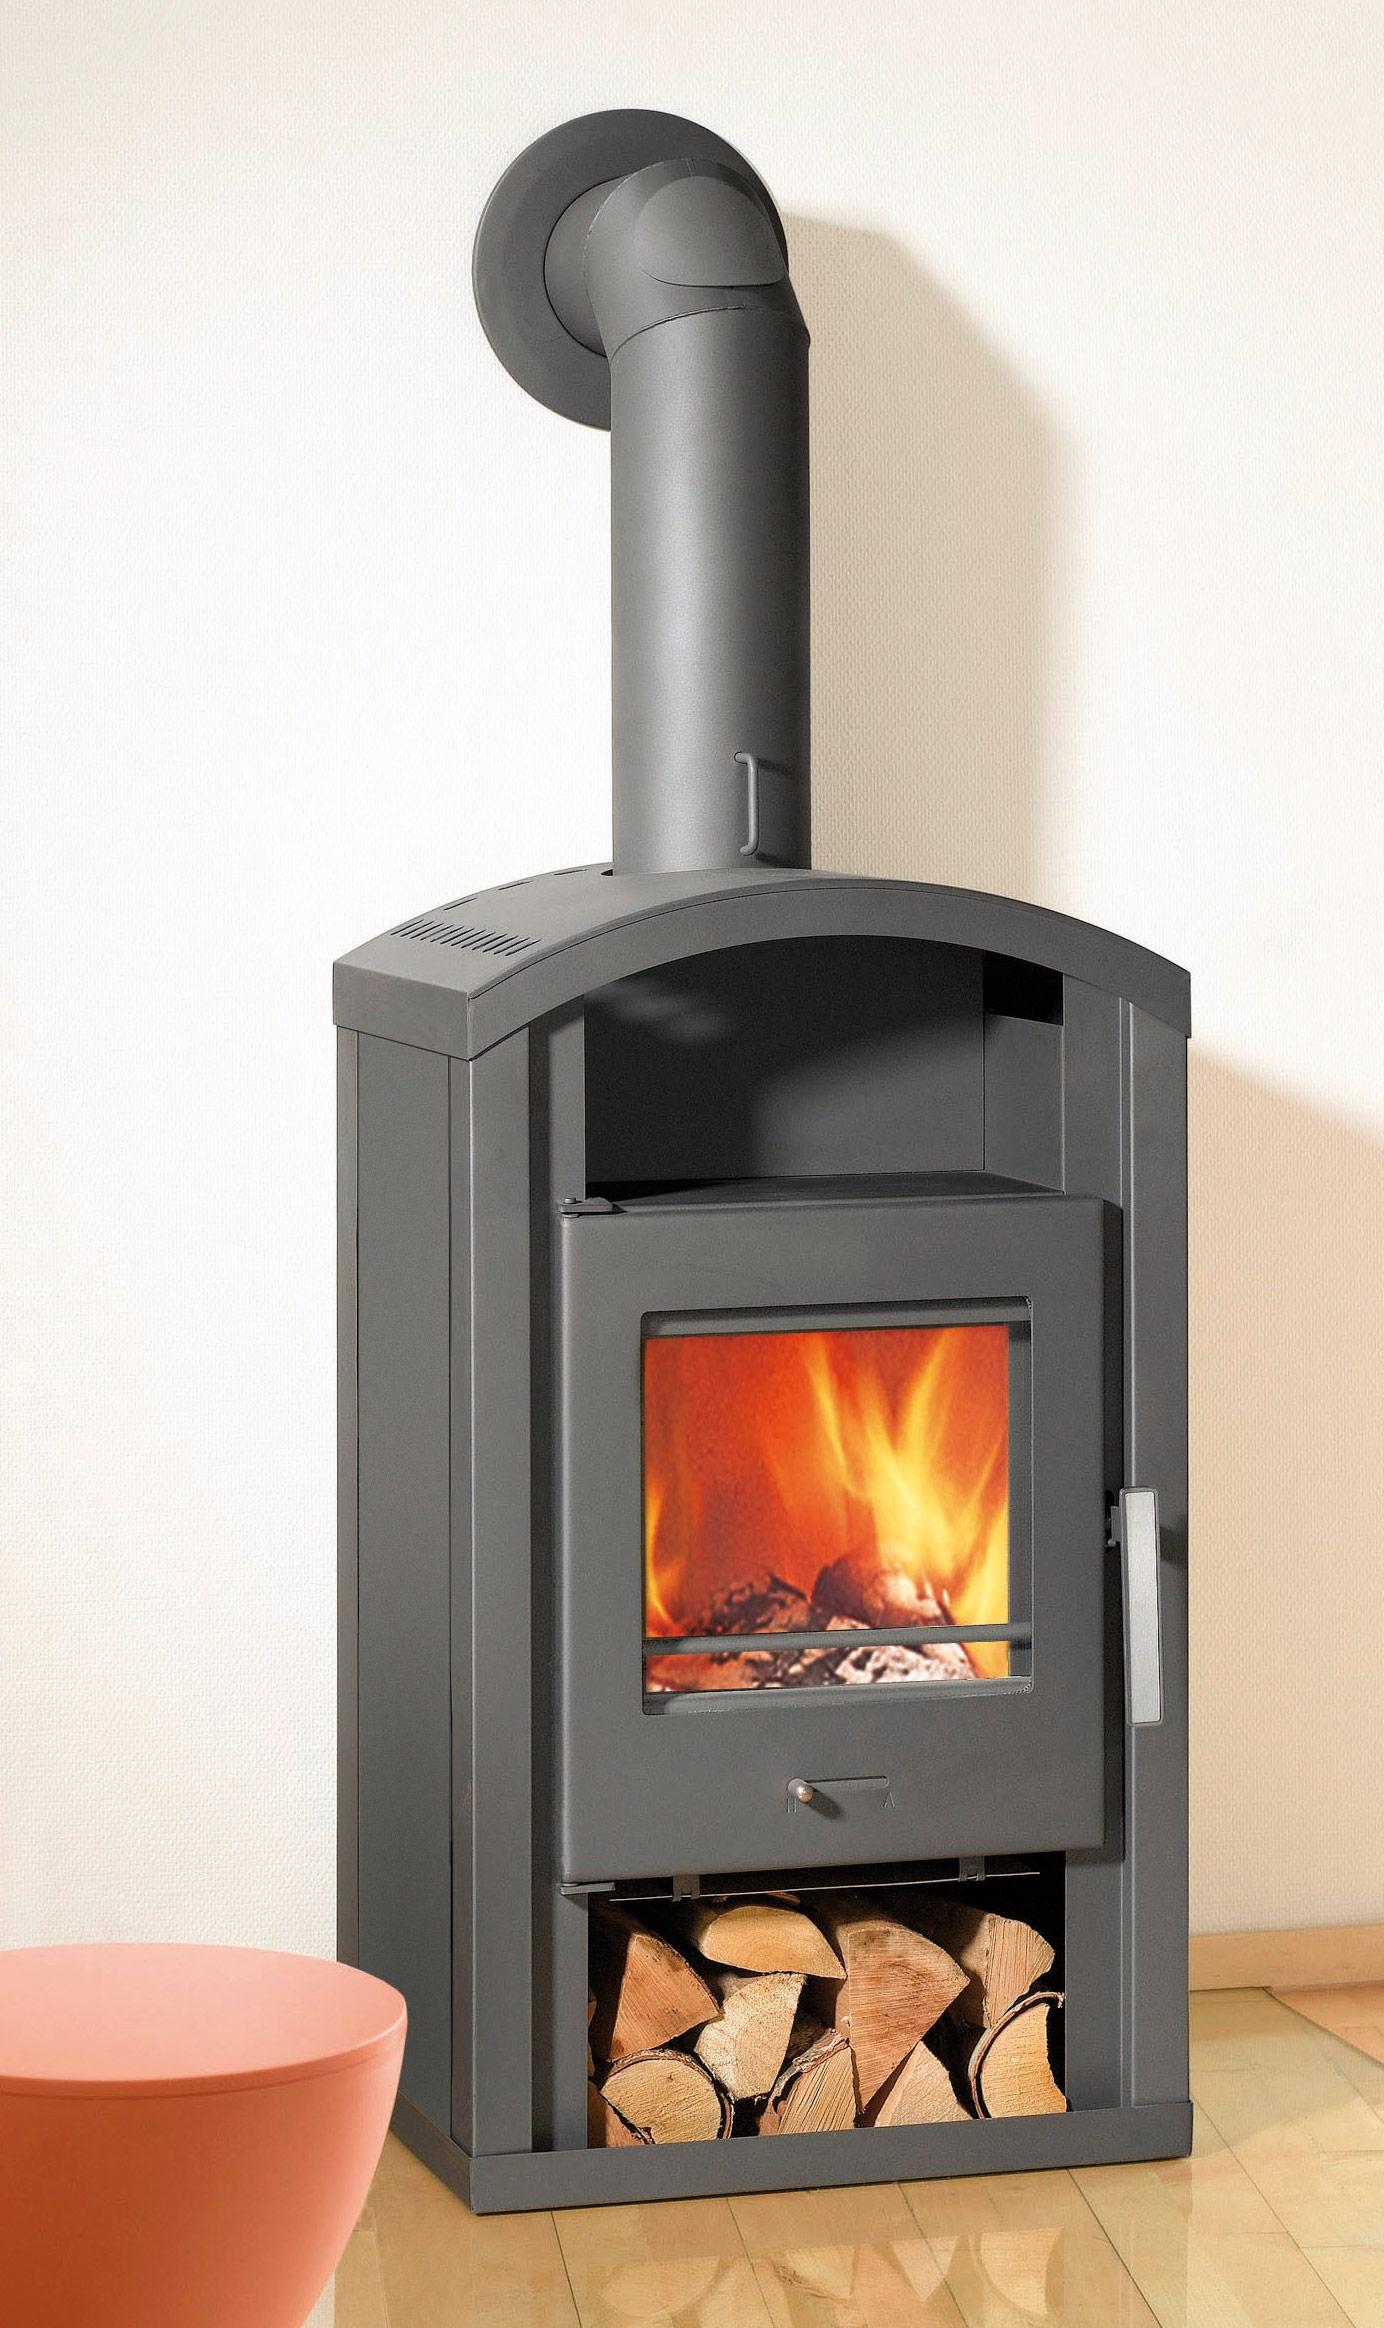 kaminofen wamsler saturn gussgrau 6 kw typ 10862 bei. Black Bedroom Furniture Sets. Home Design Ideas